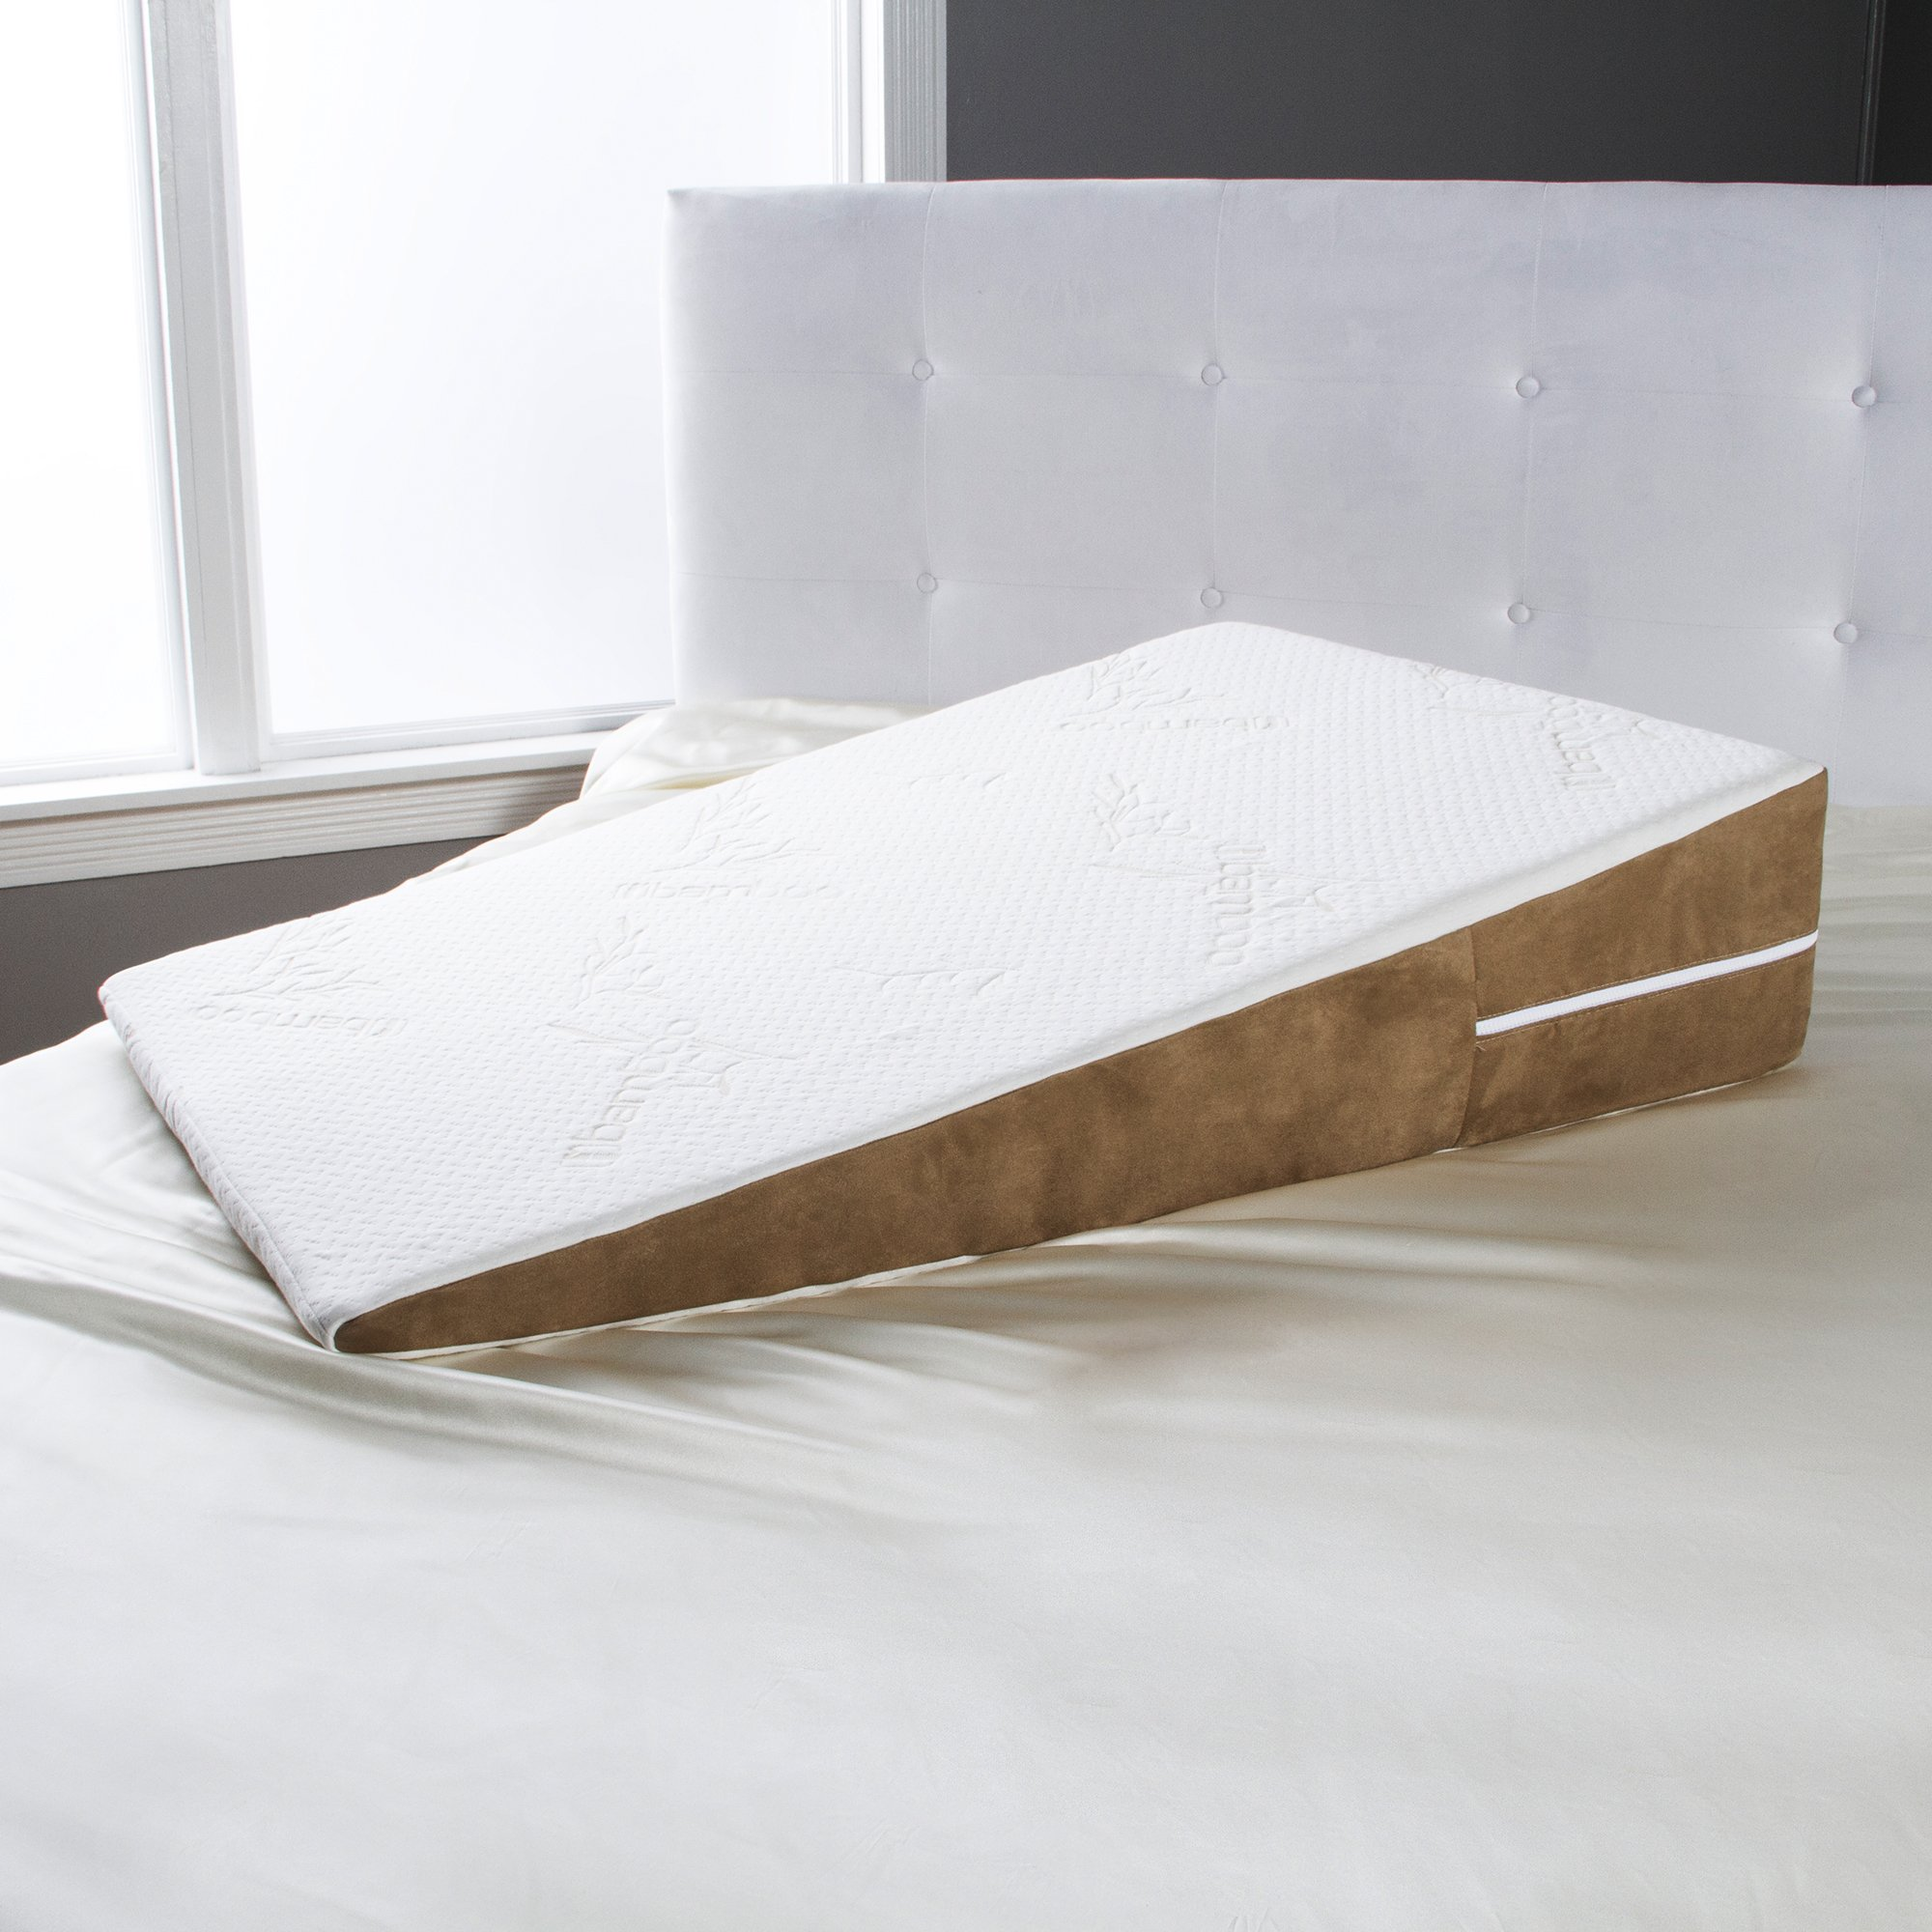 Avana Bed Wedge Memory Foam GERD Pillow, X-Large by Avana